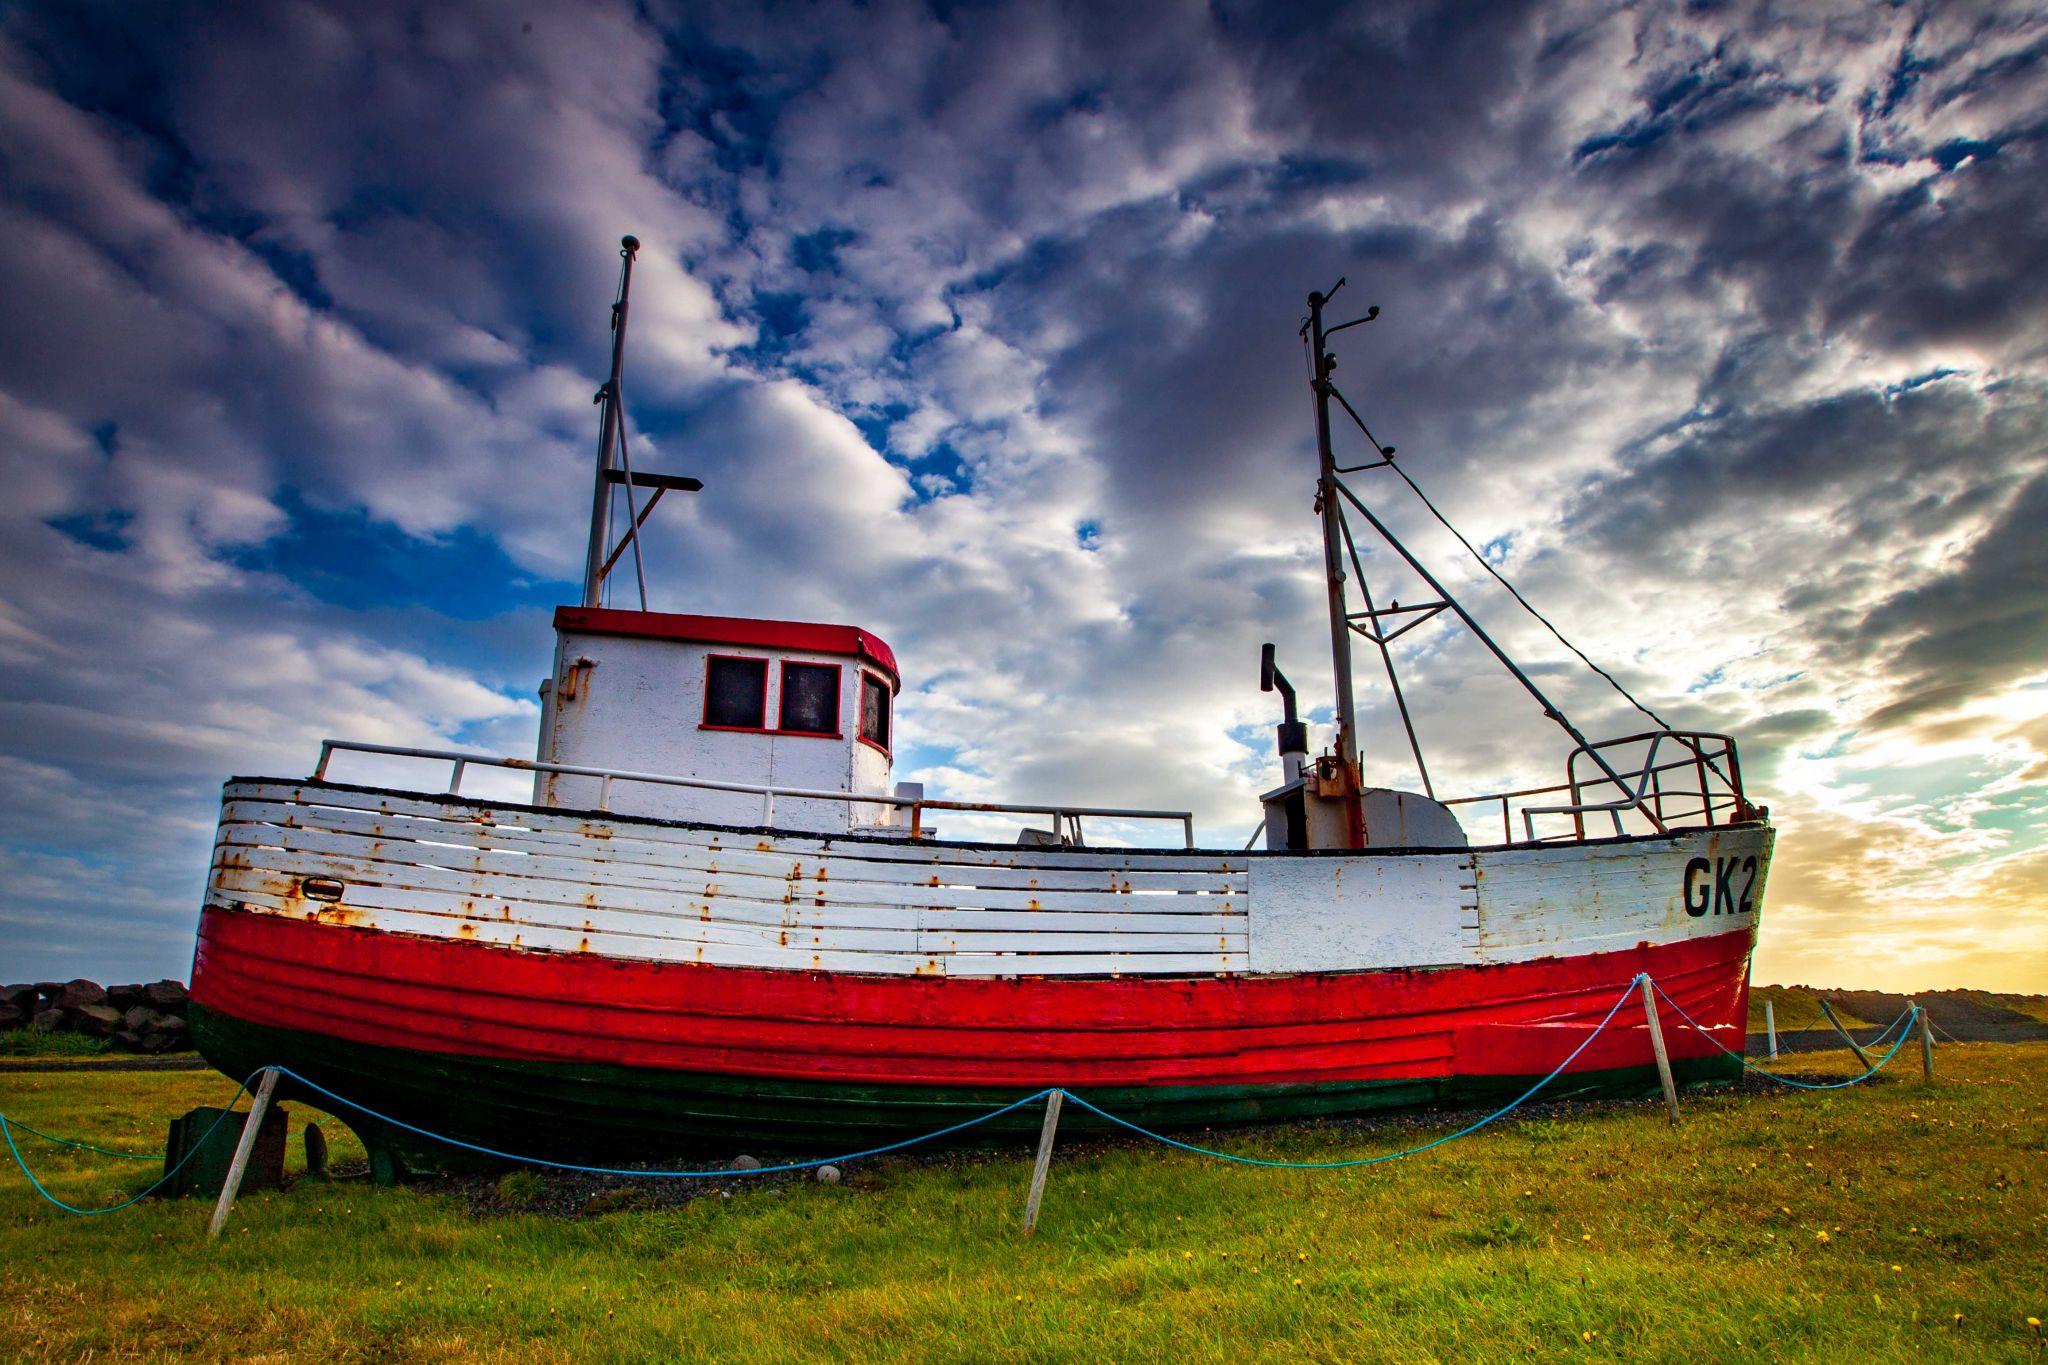 Fishing Boat Gardur Folk Museum, Iceland